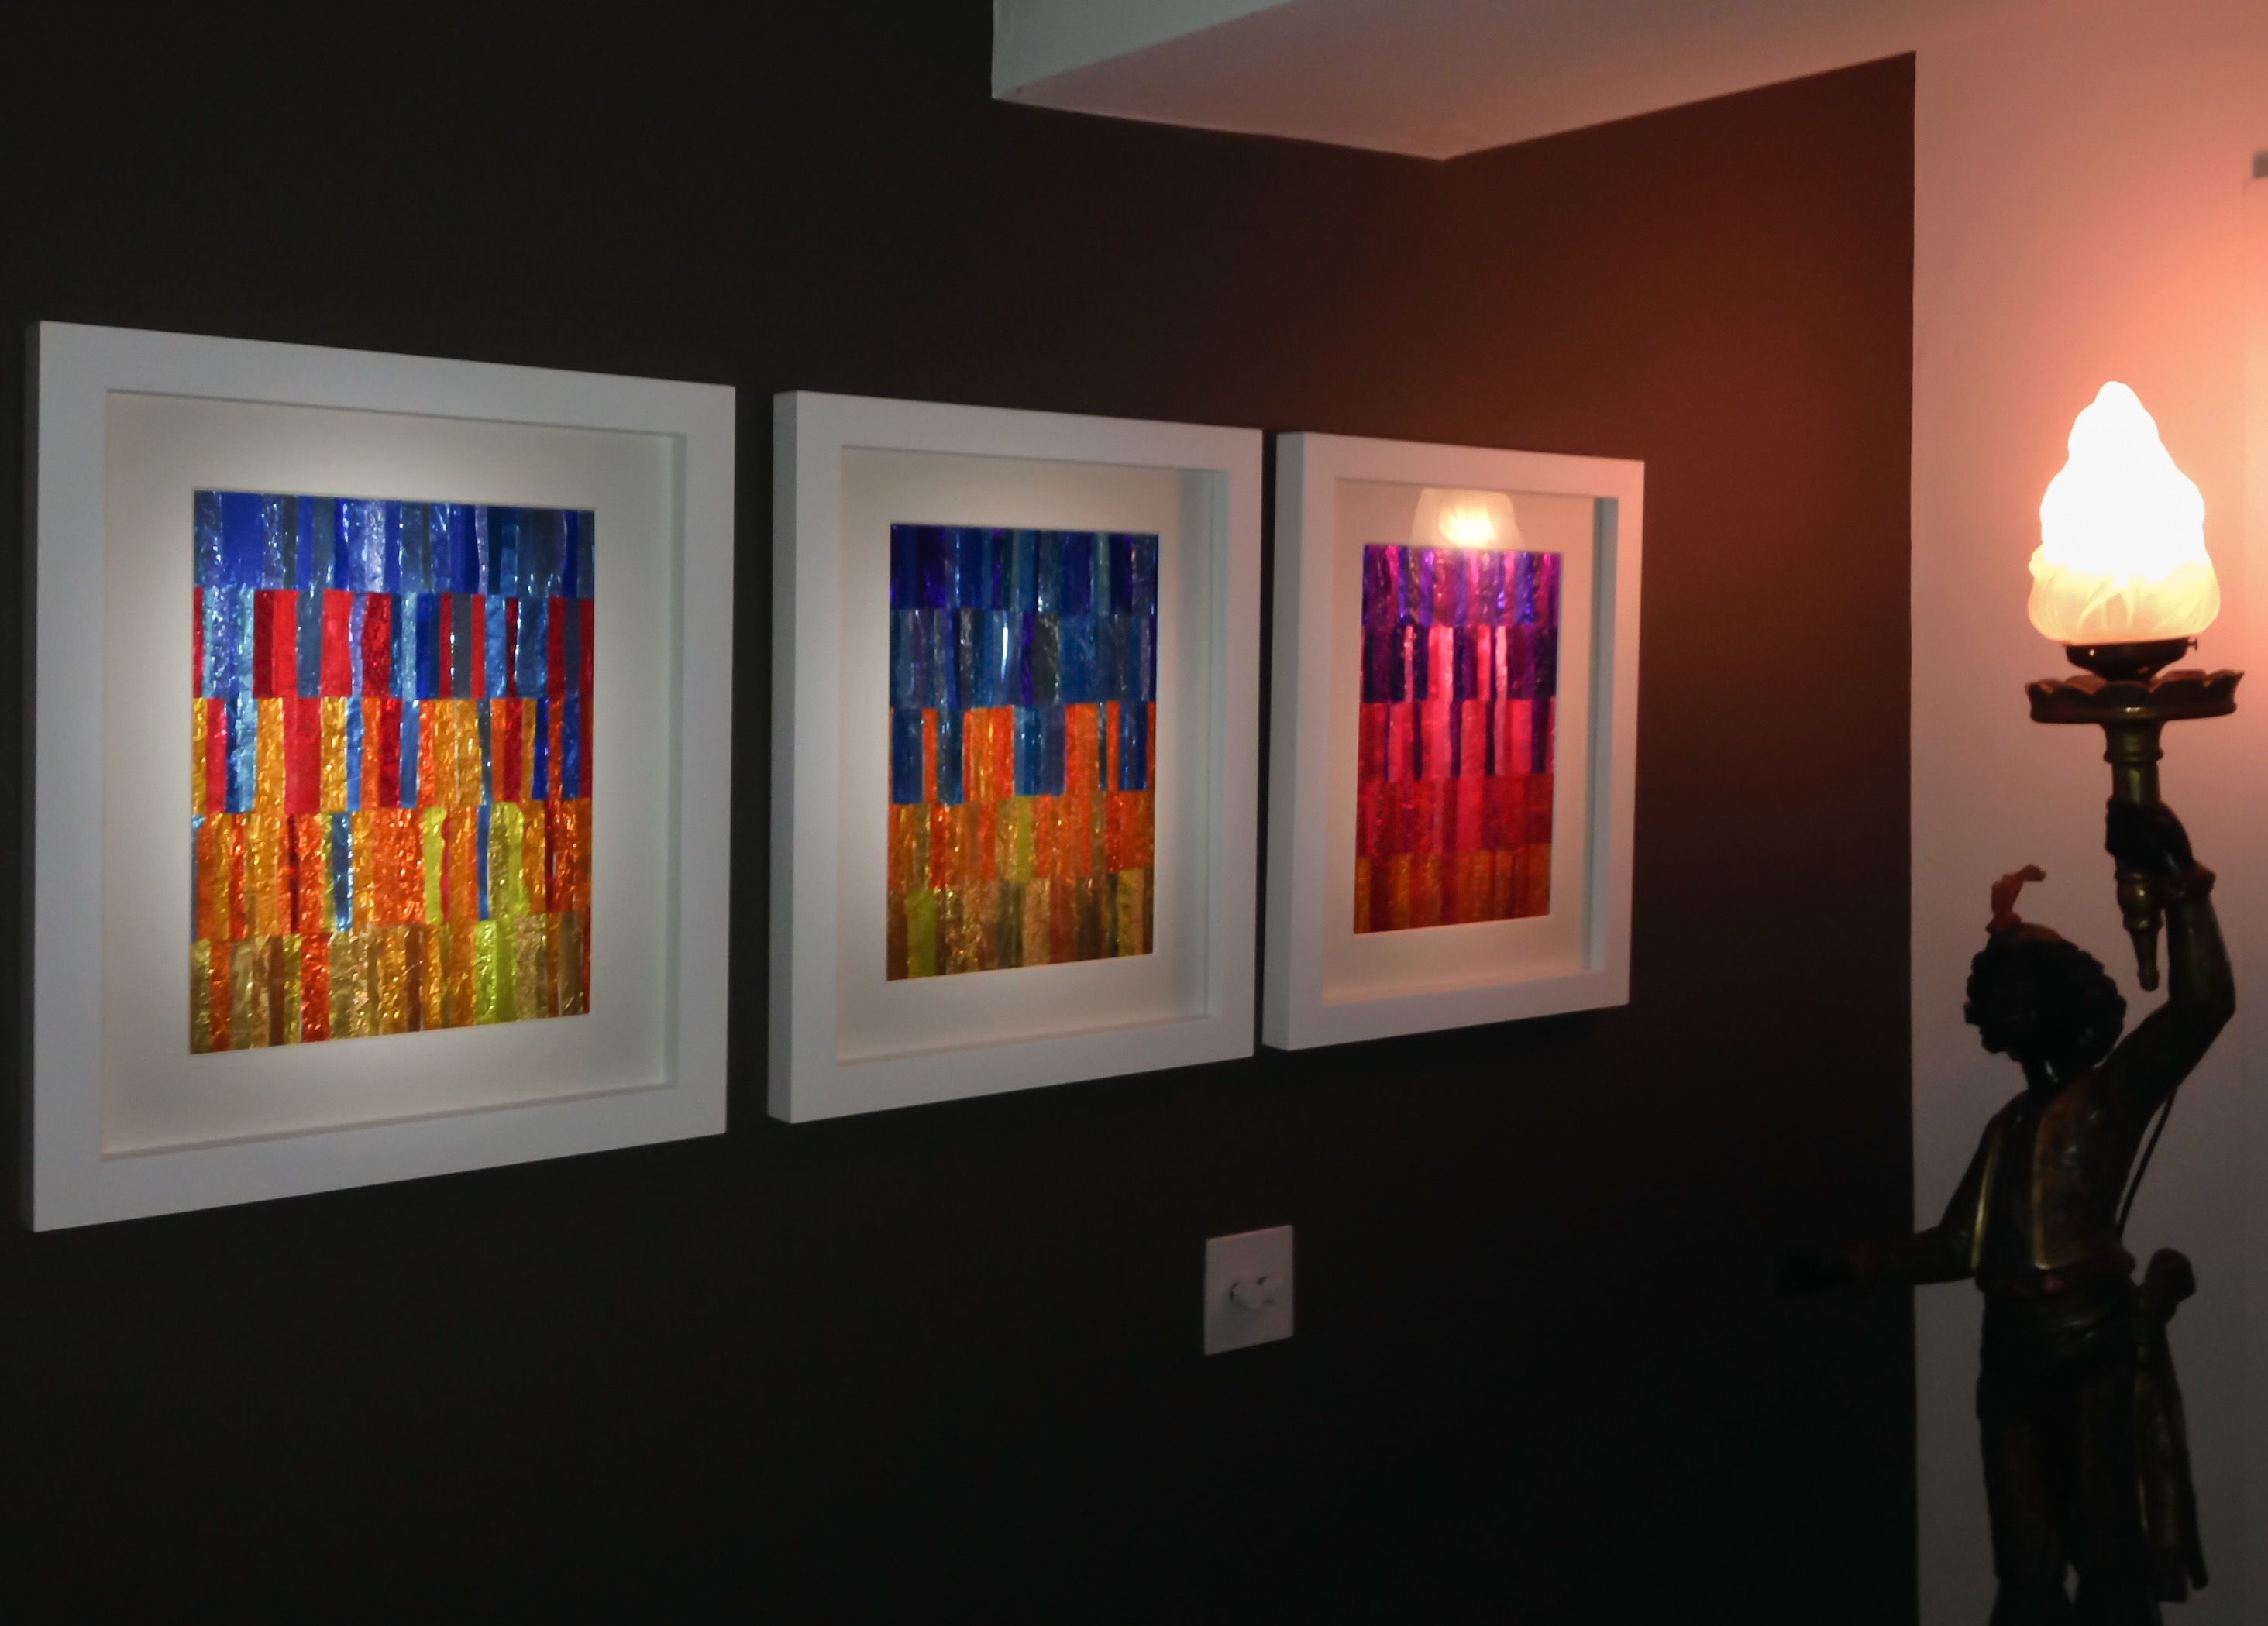 Sunset & Sunrise Foil Collage Artwork Commissions. Making art. The ...